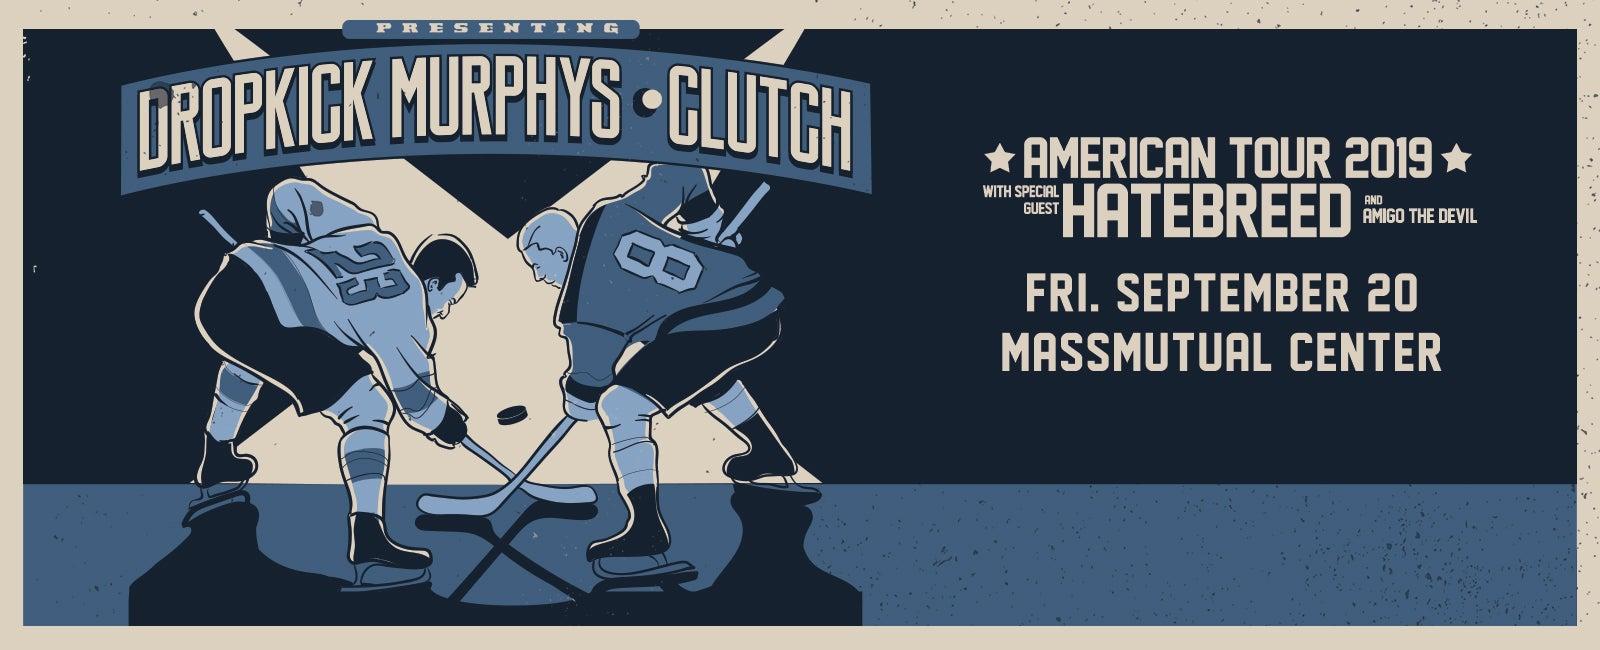 Dropkick Murphys and Clutch